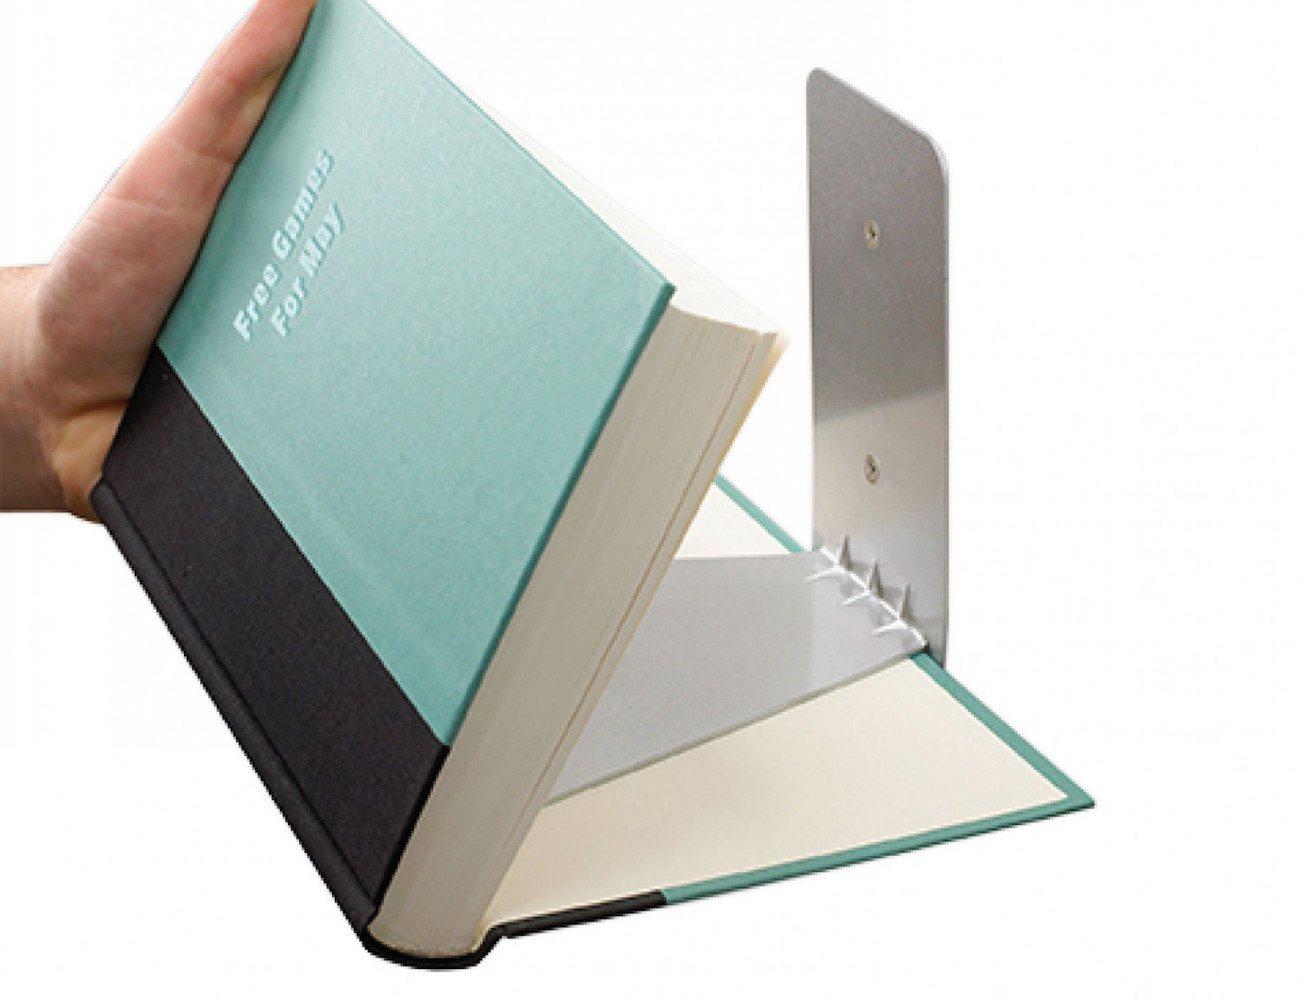 Fly Brary Book Shelf Gadget Flow